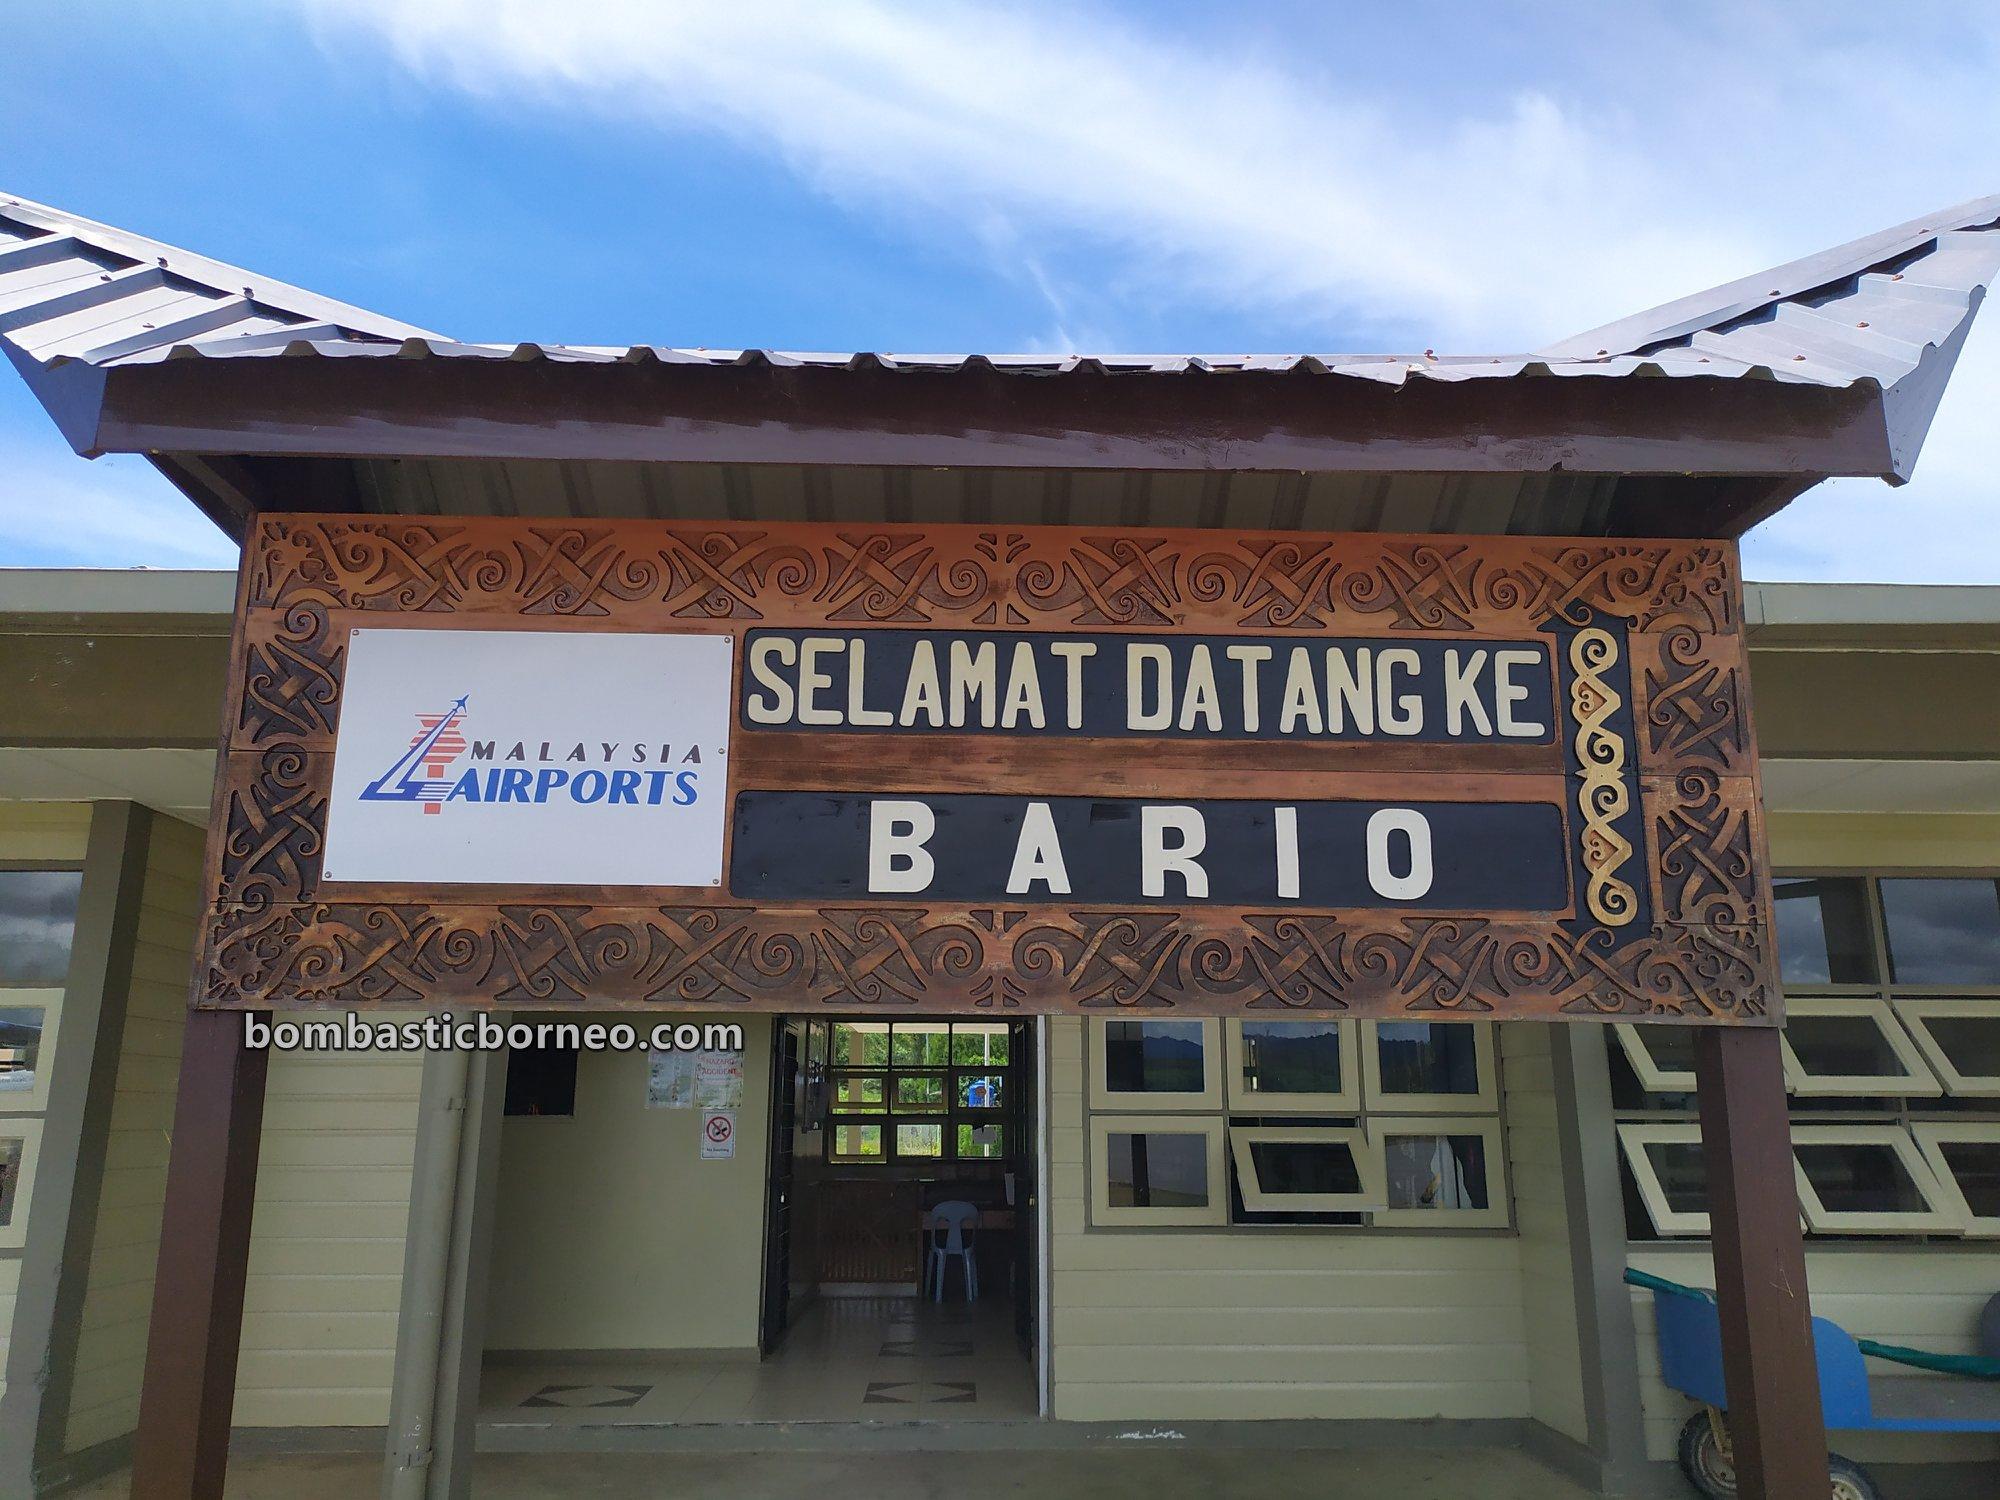 airport, Kelabit Highlands, Maswings, Twin otter. backpackers, destination, exploration, Interior village, native, Tourism, Cross Border, Borneo, 穿越婆罗洲砂拉越, 巴里奥内陆高原, 乌鲁人土著部落,